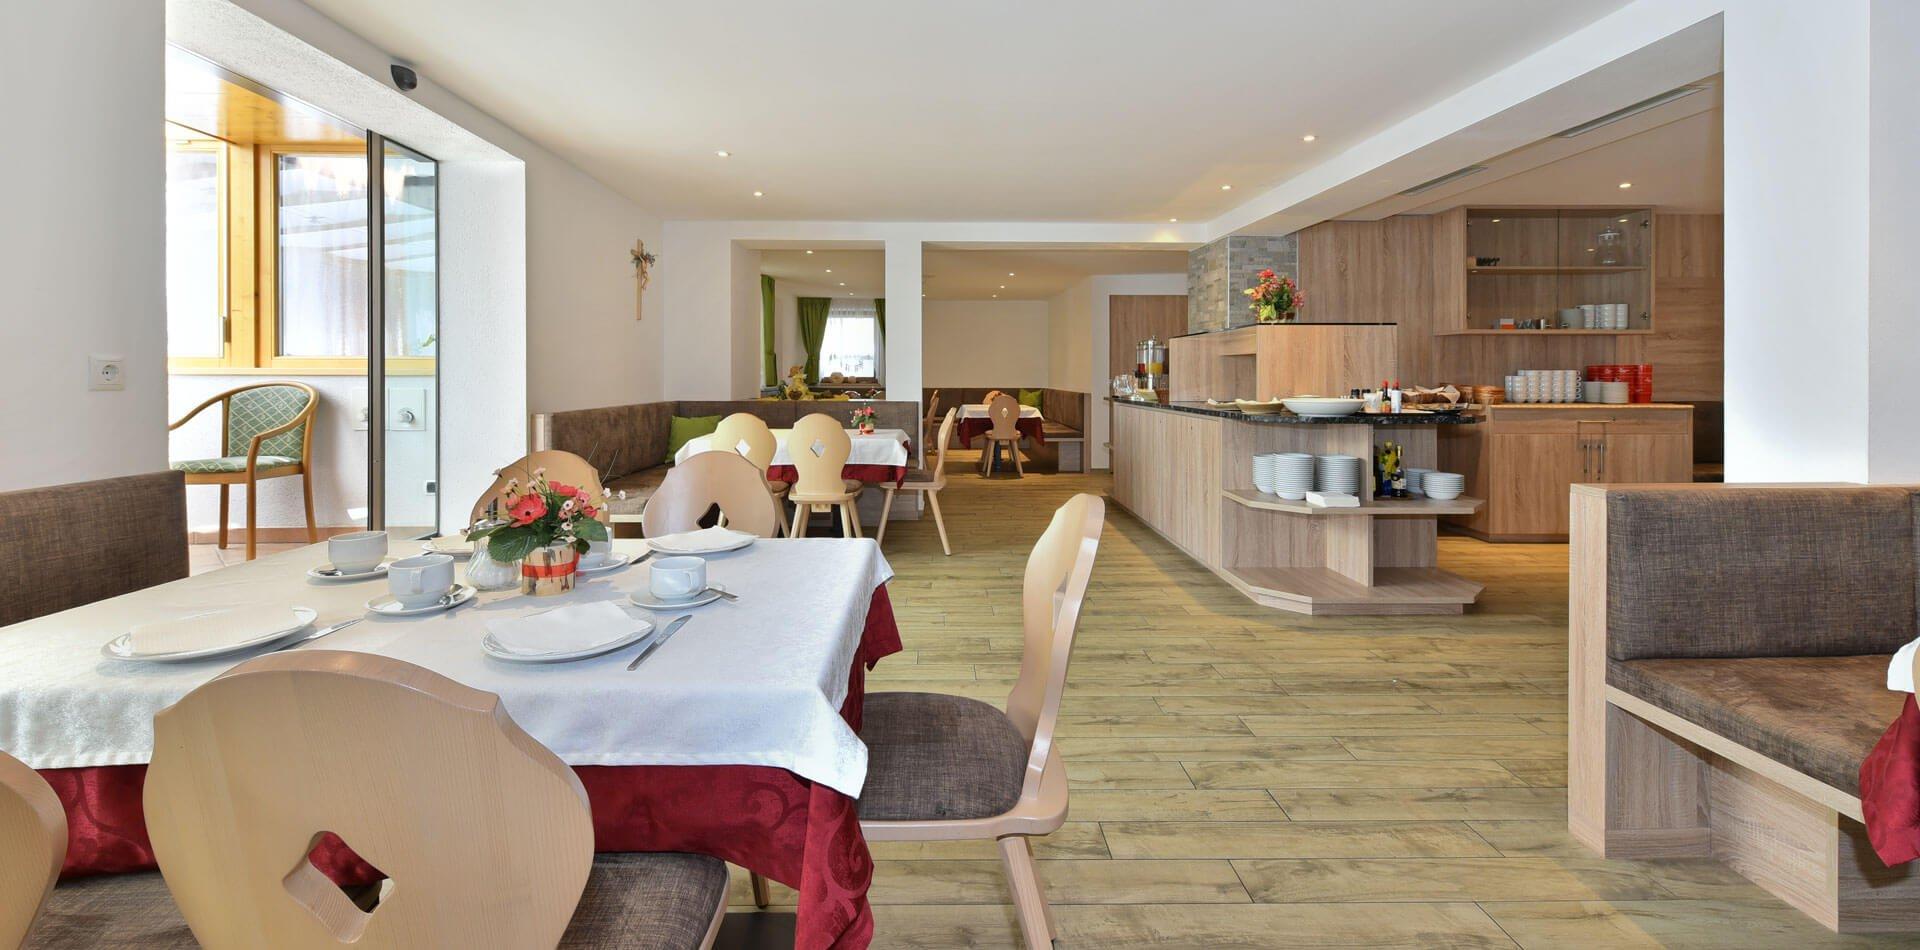 familienurlaub-meransen-hotel